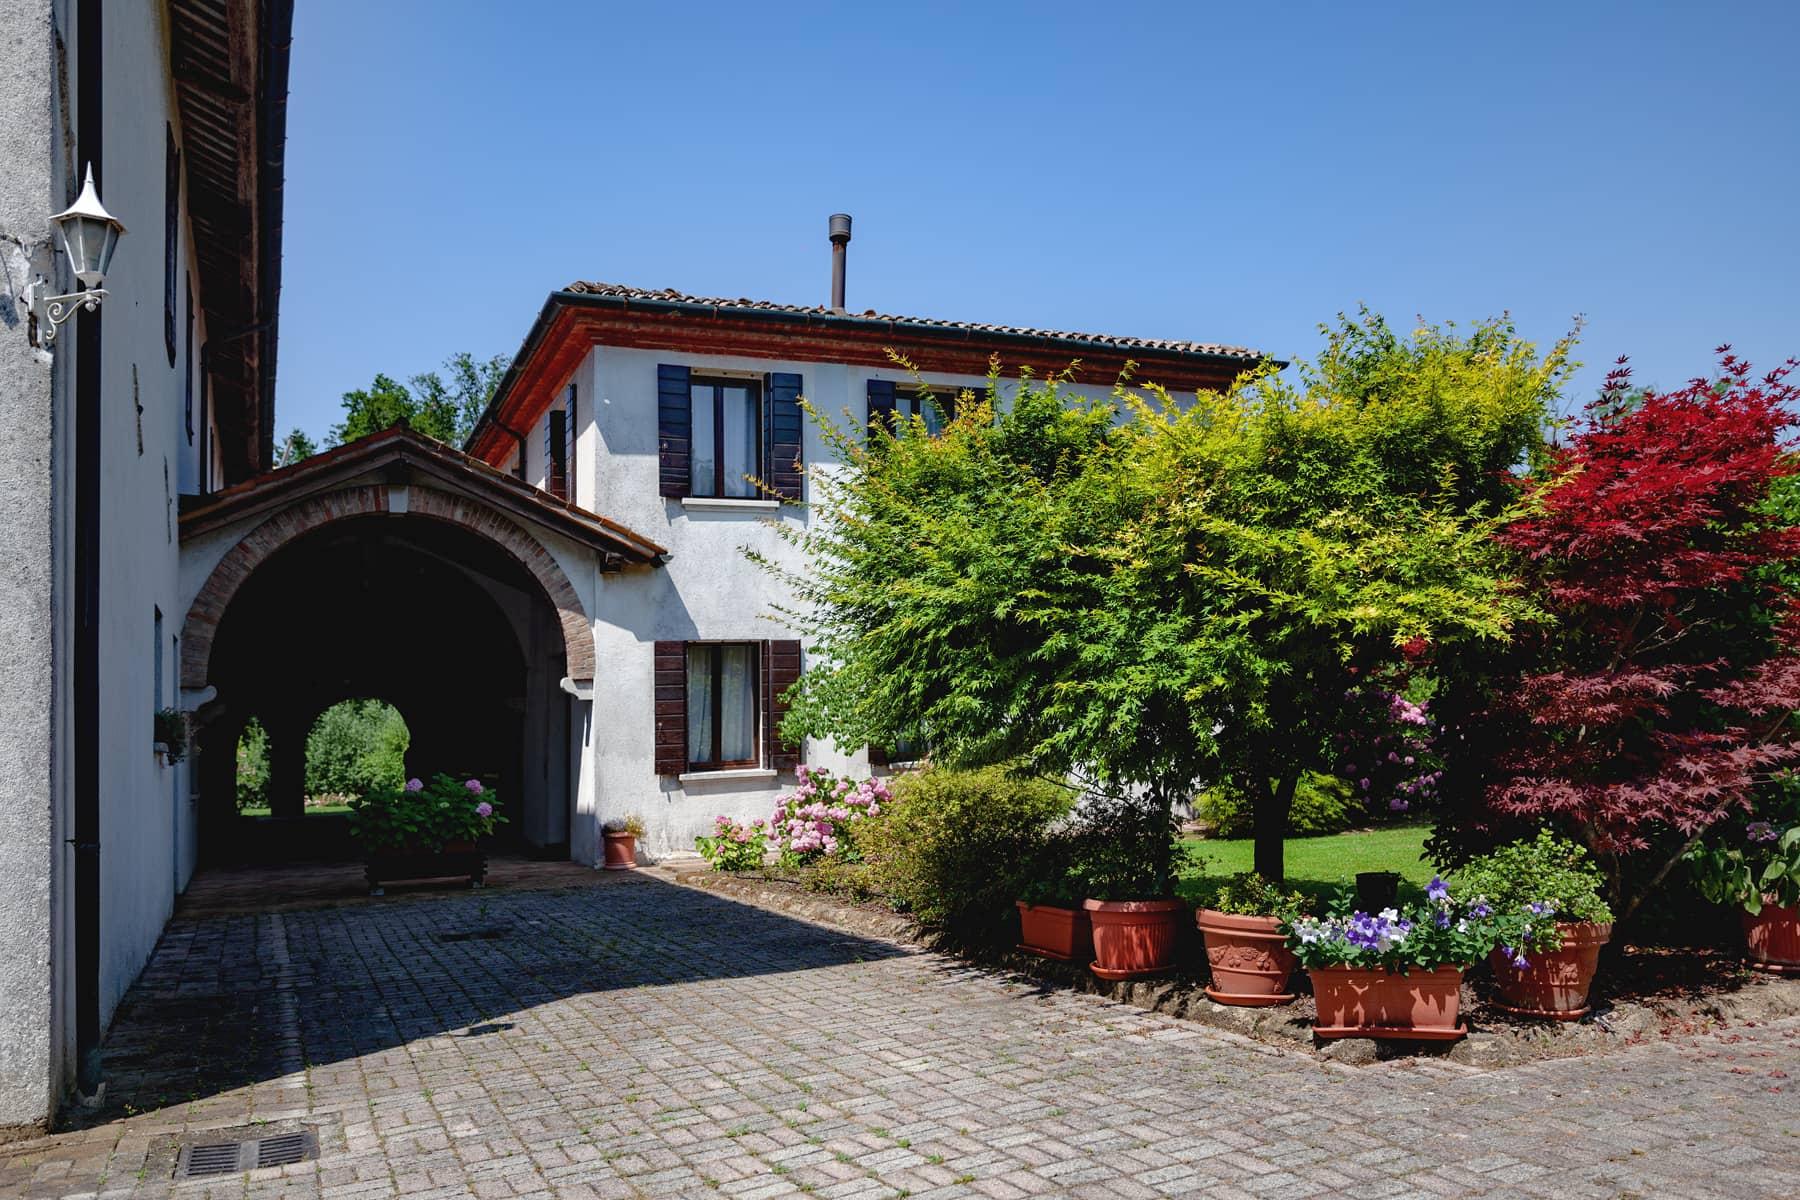 Villa in Vendita a Carbonera: 5 locali, 850 mq - Foto 3